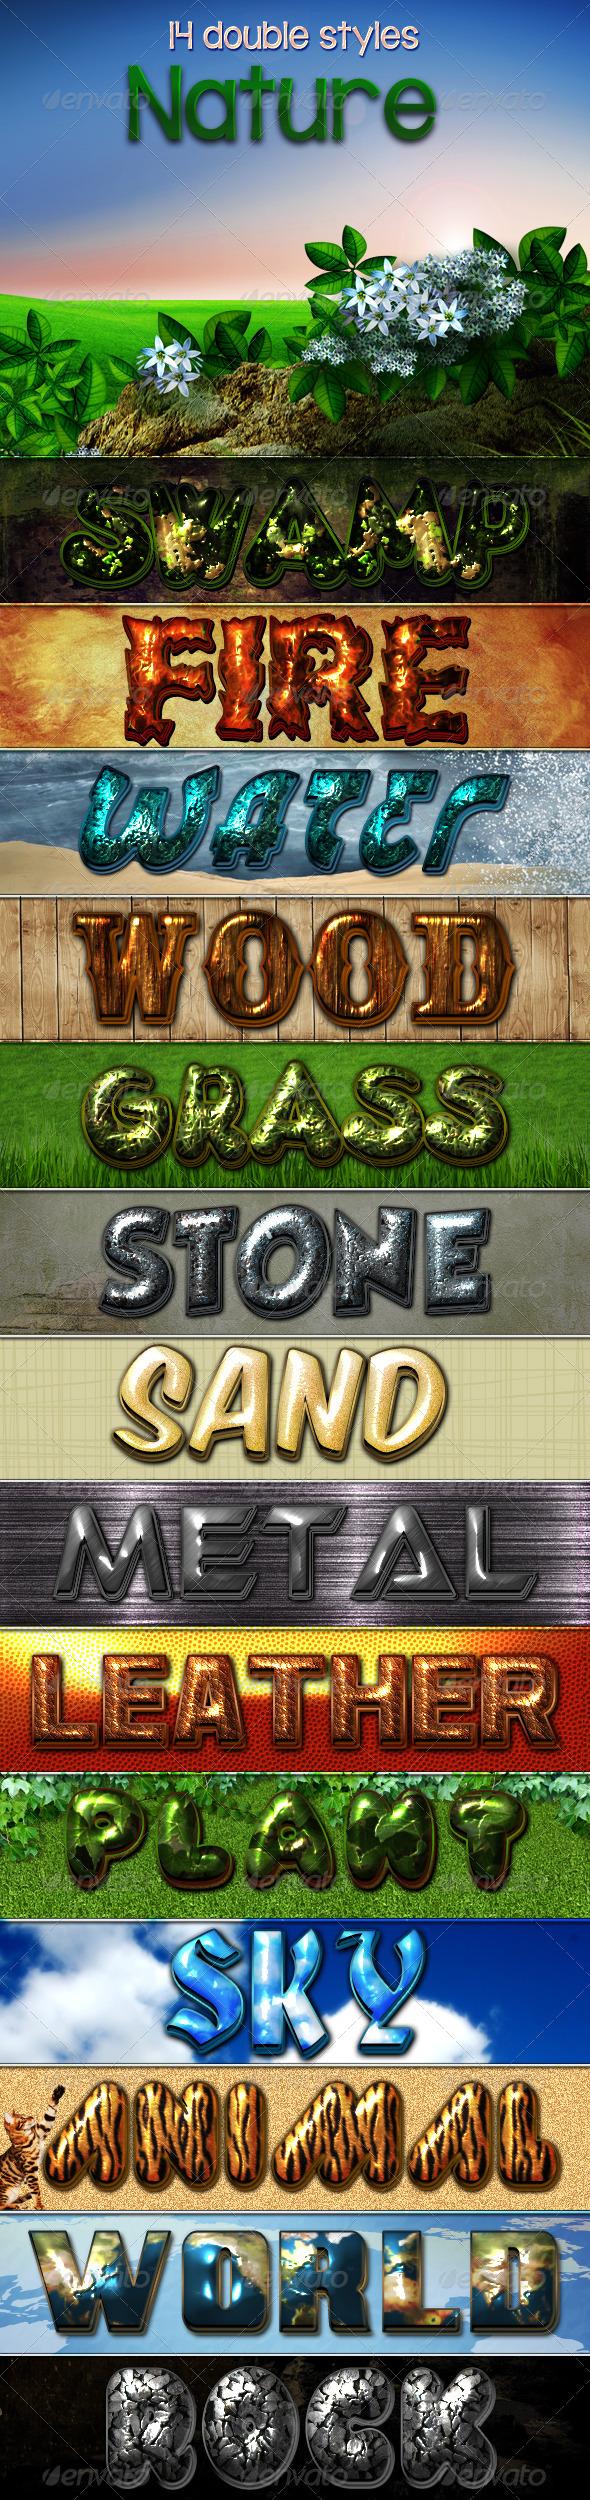 Nature Styles | Photoshop Text Styles | Style, Photoshop ...